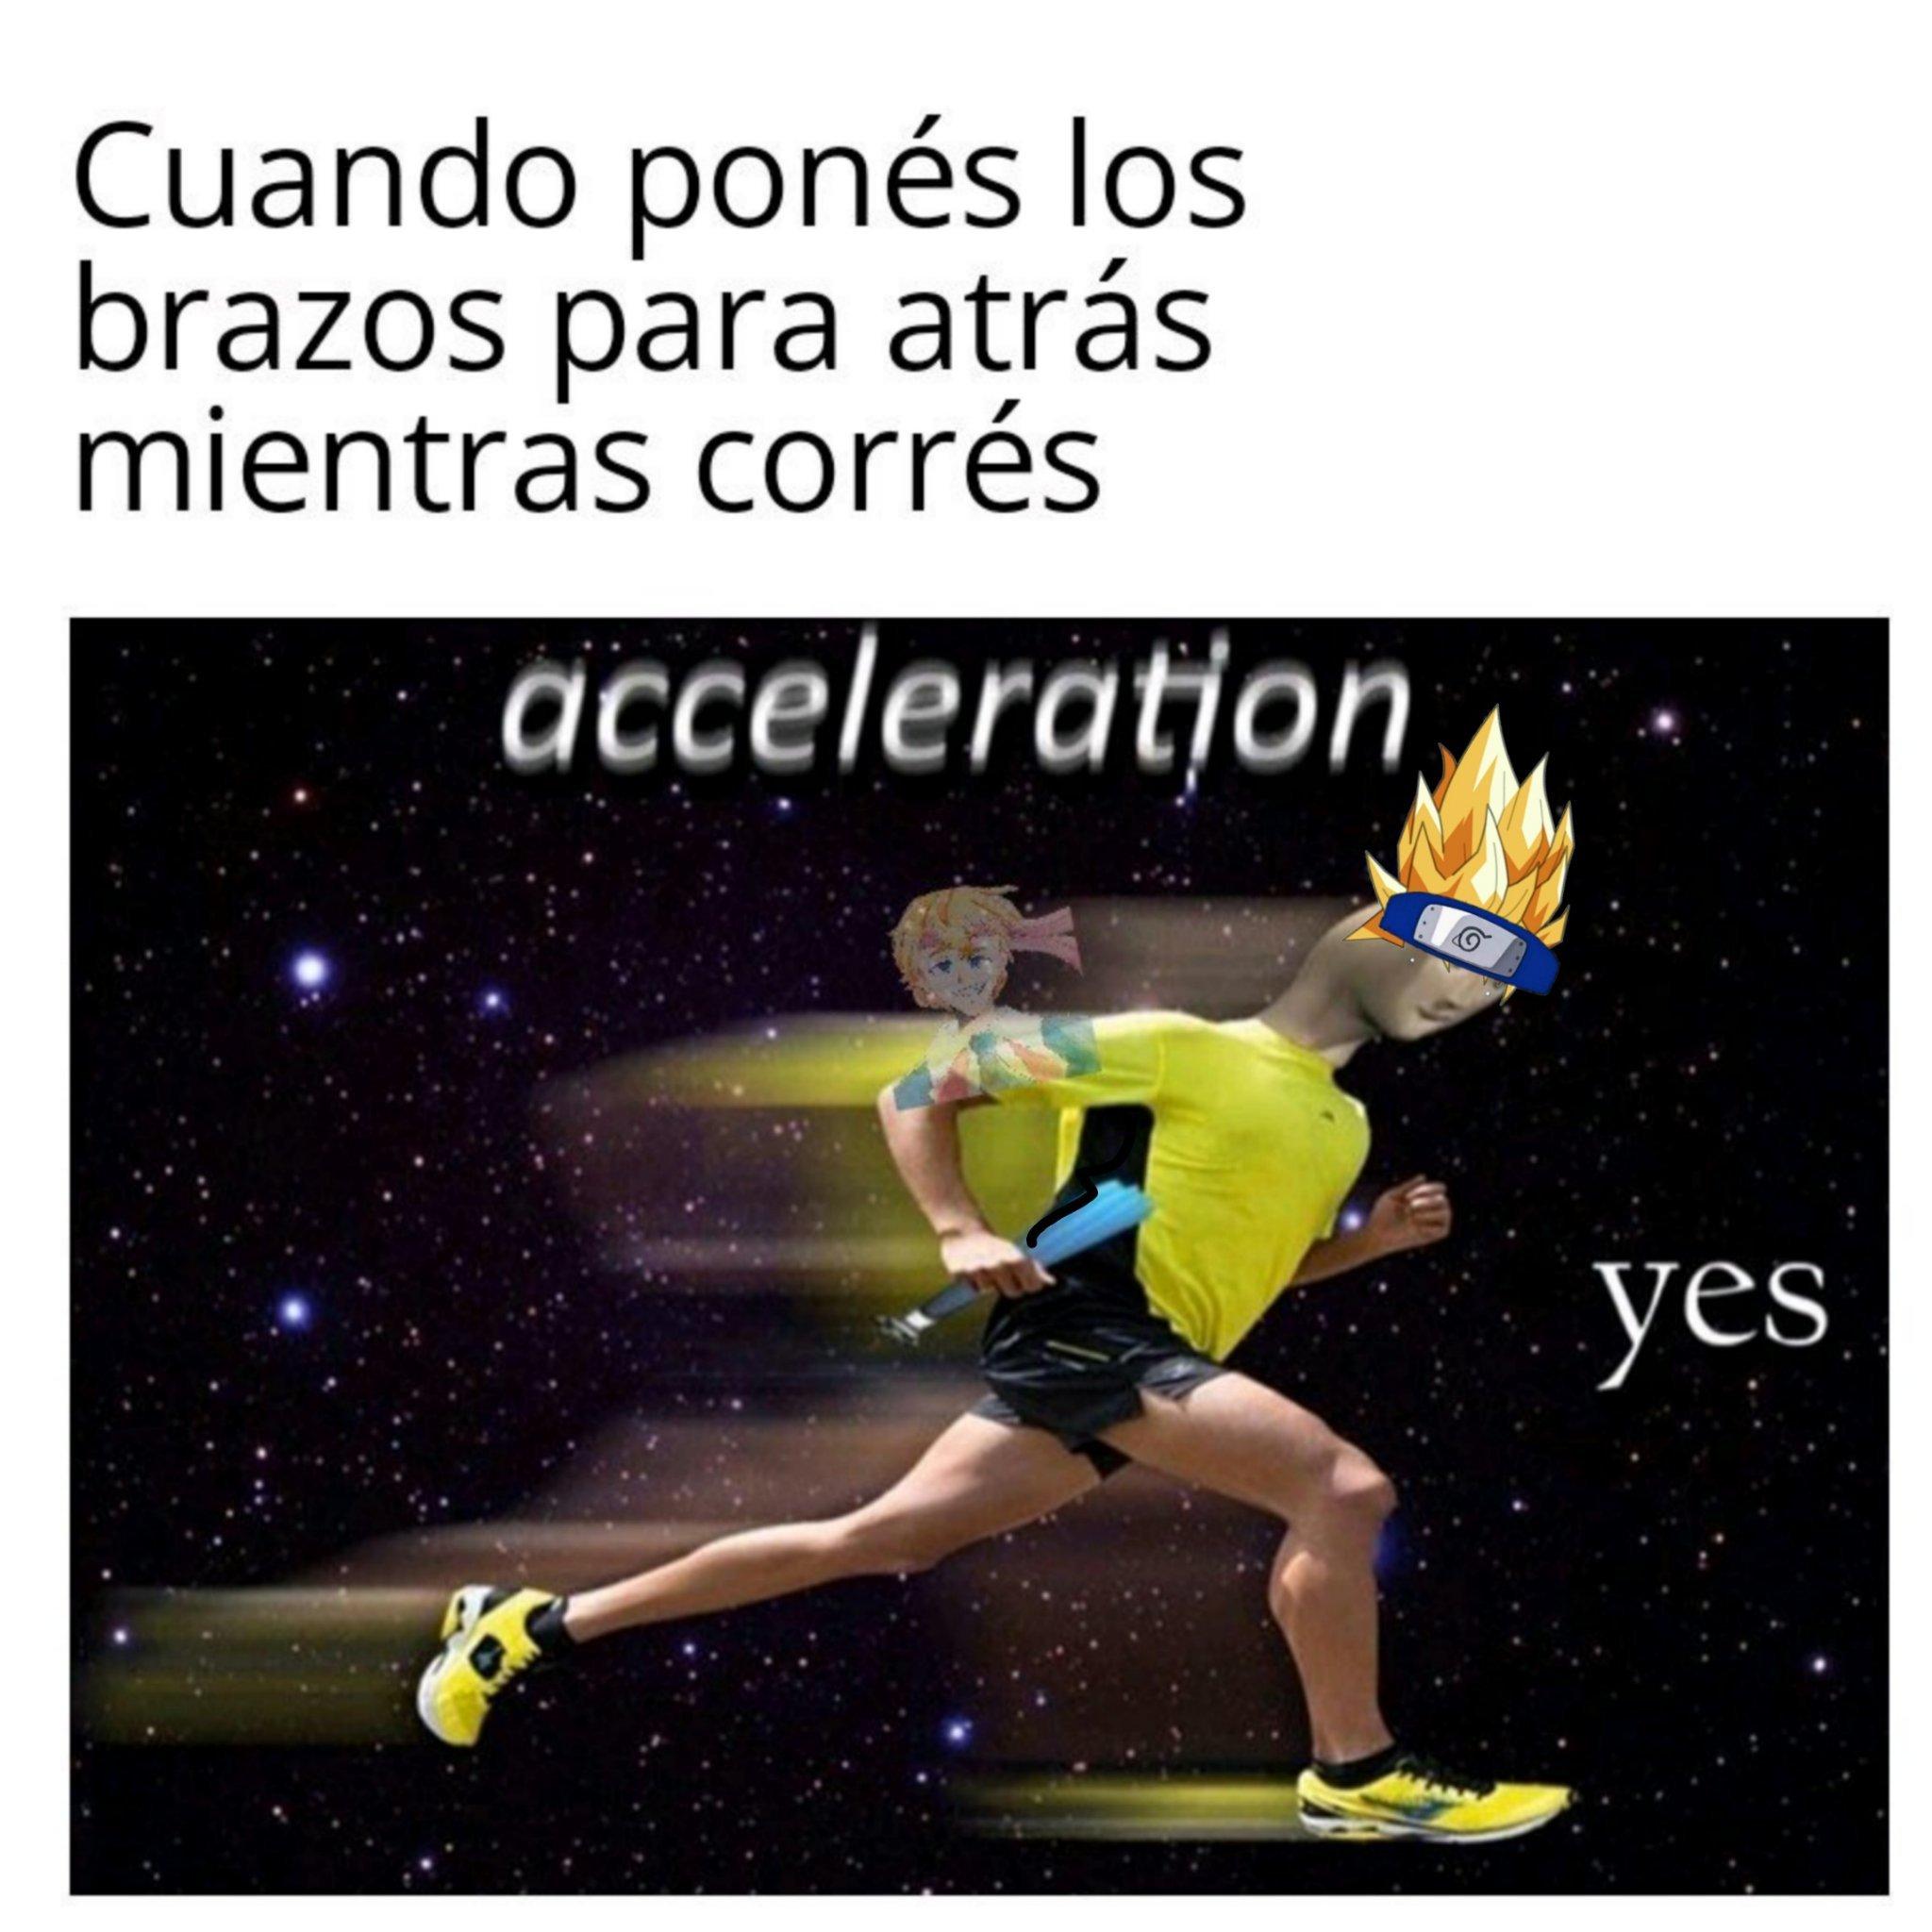 edicion permitida del meme de HiperSpeedX